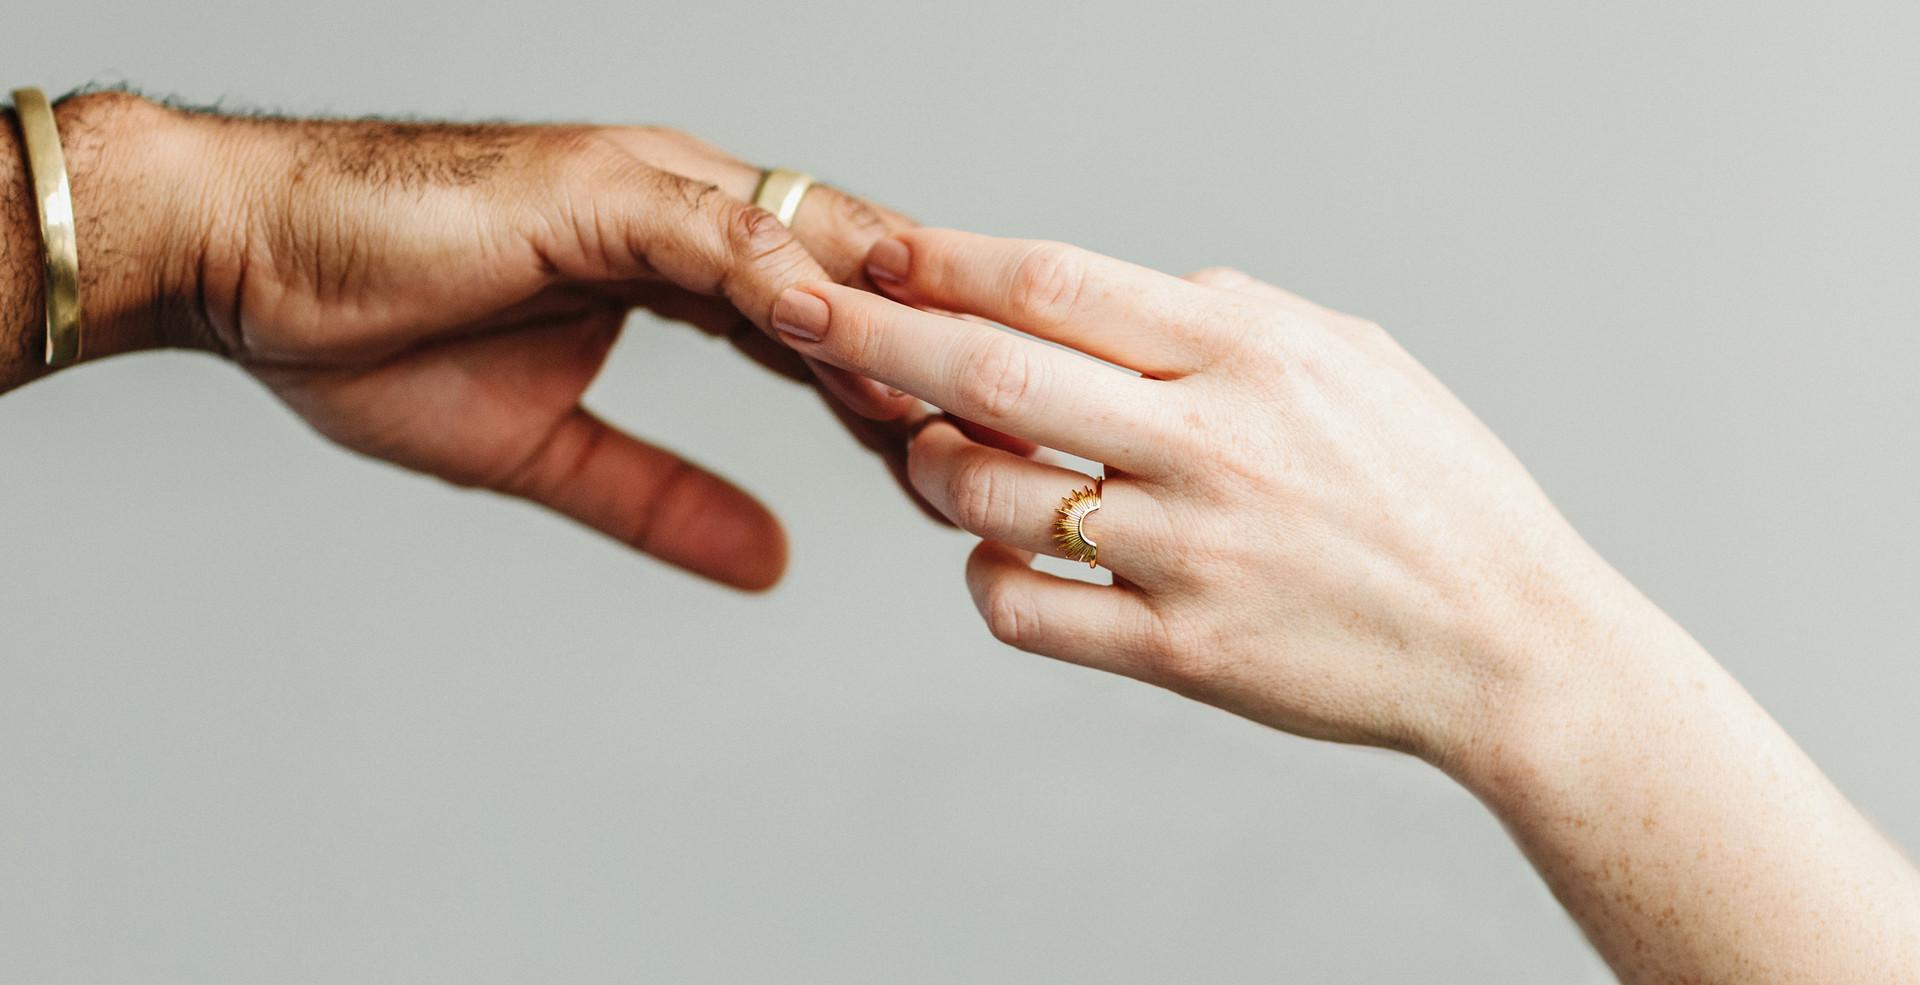 black hand touching white hand with sunburst engagement ring